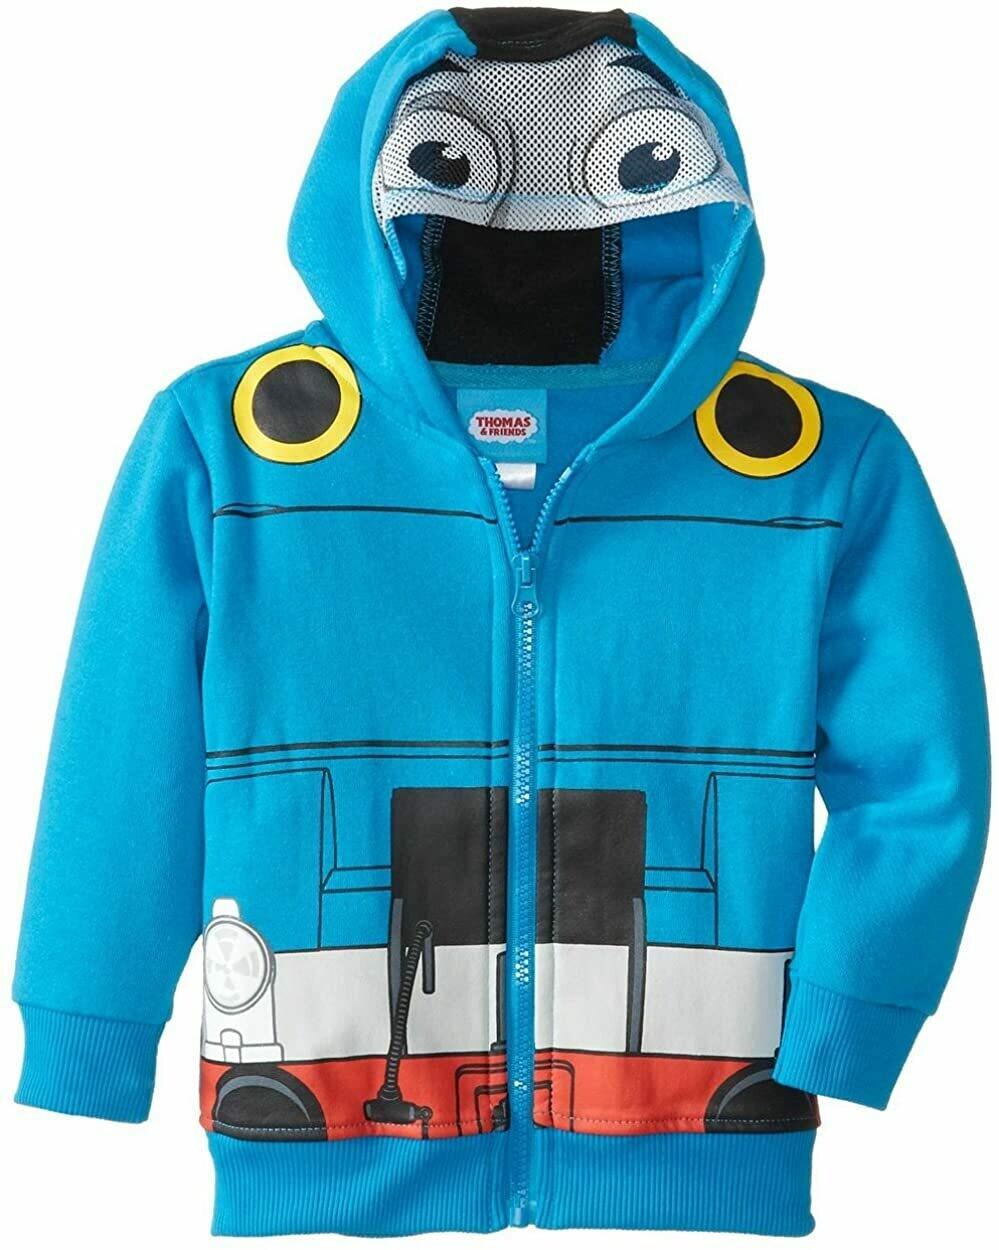 Hoodie - Thomas Full Zip (blue / engine front) - 4T